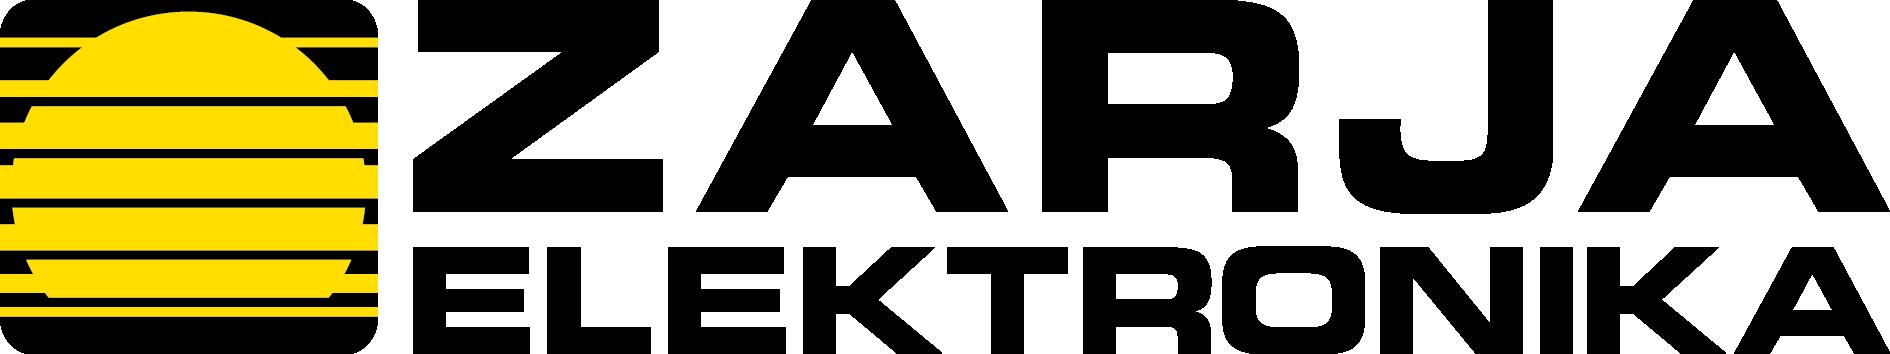 Zarja Elektronika Logo